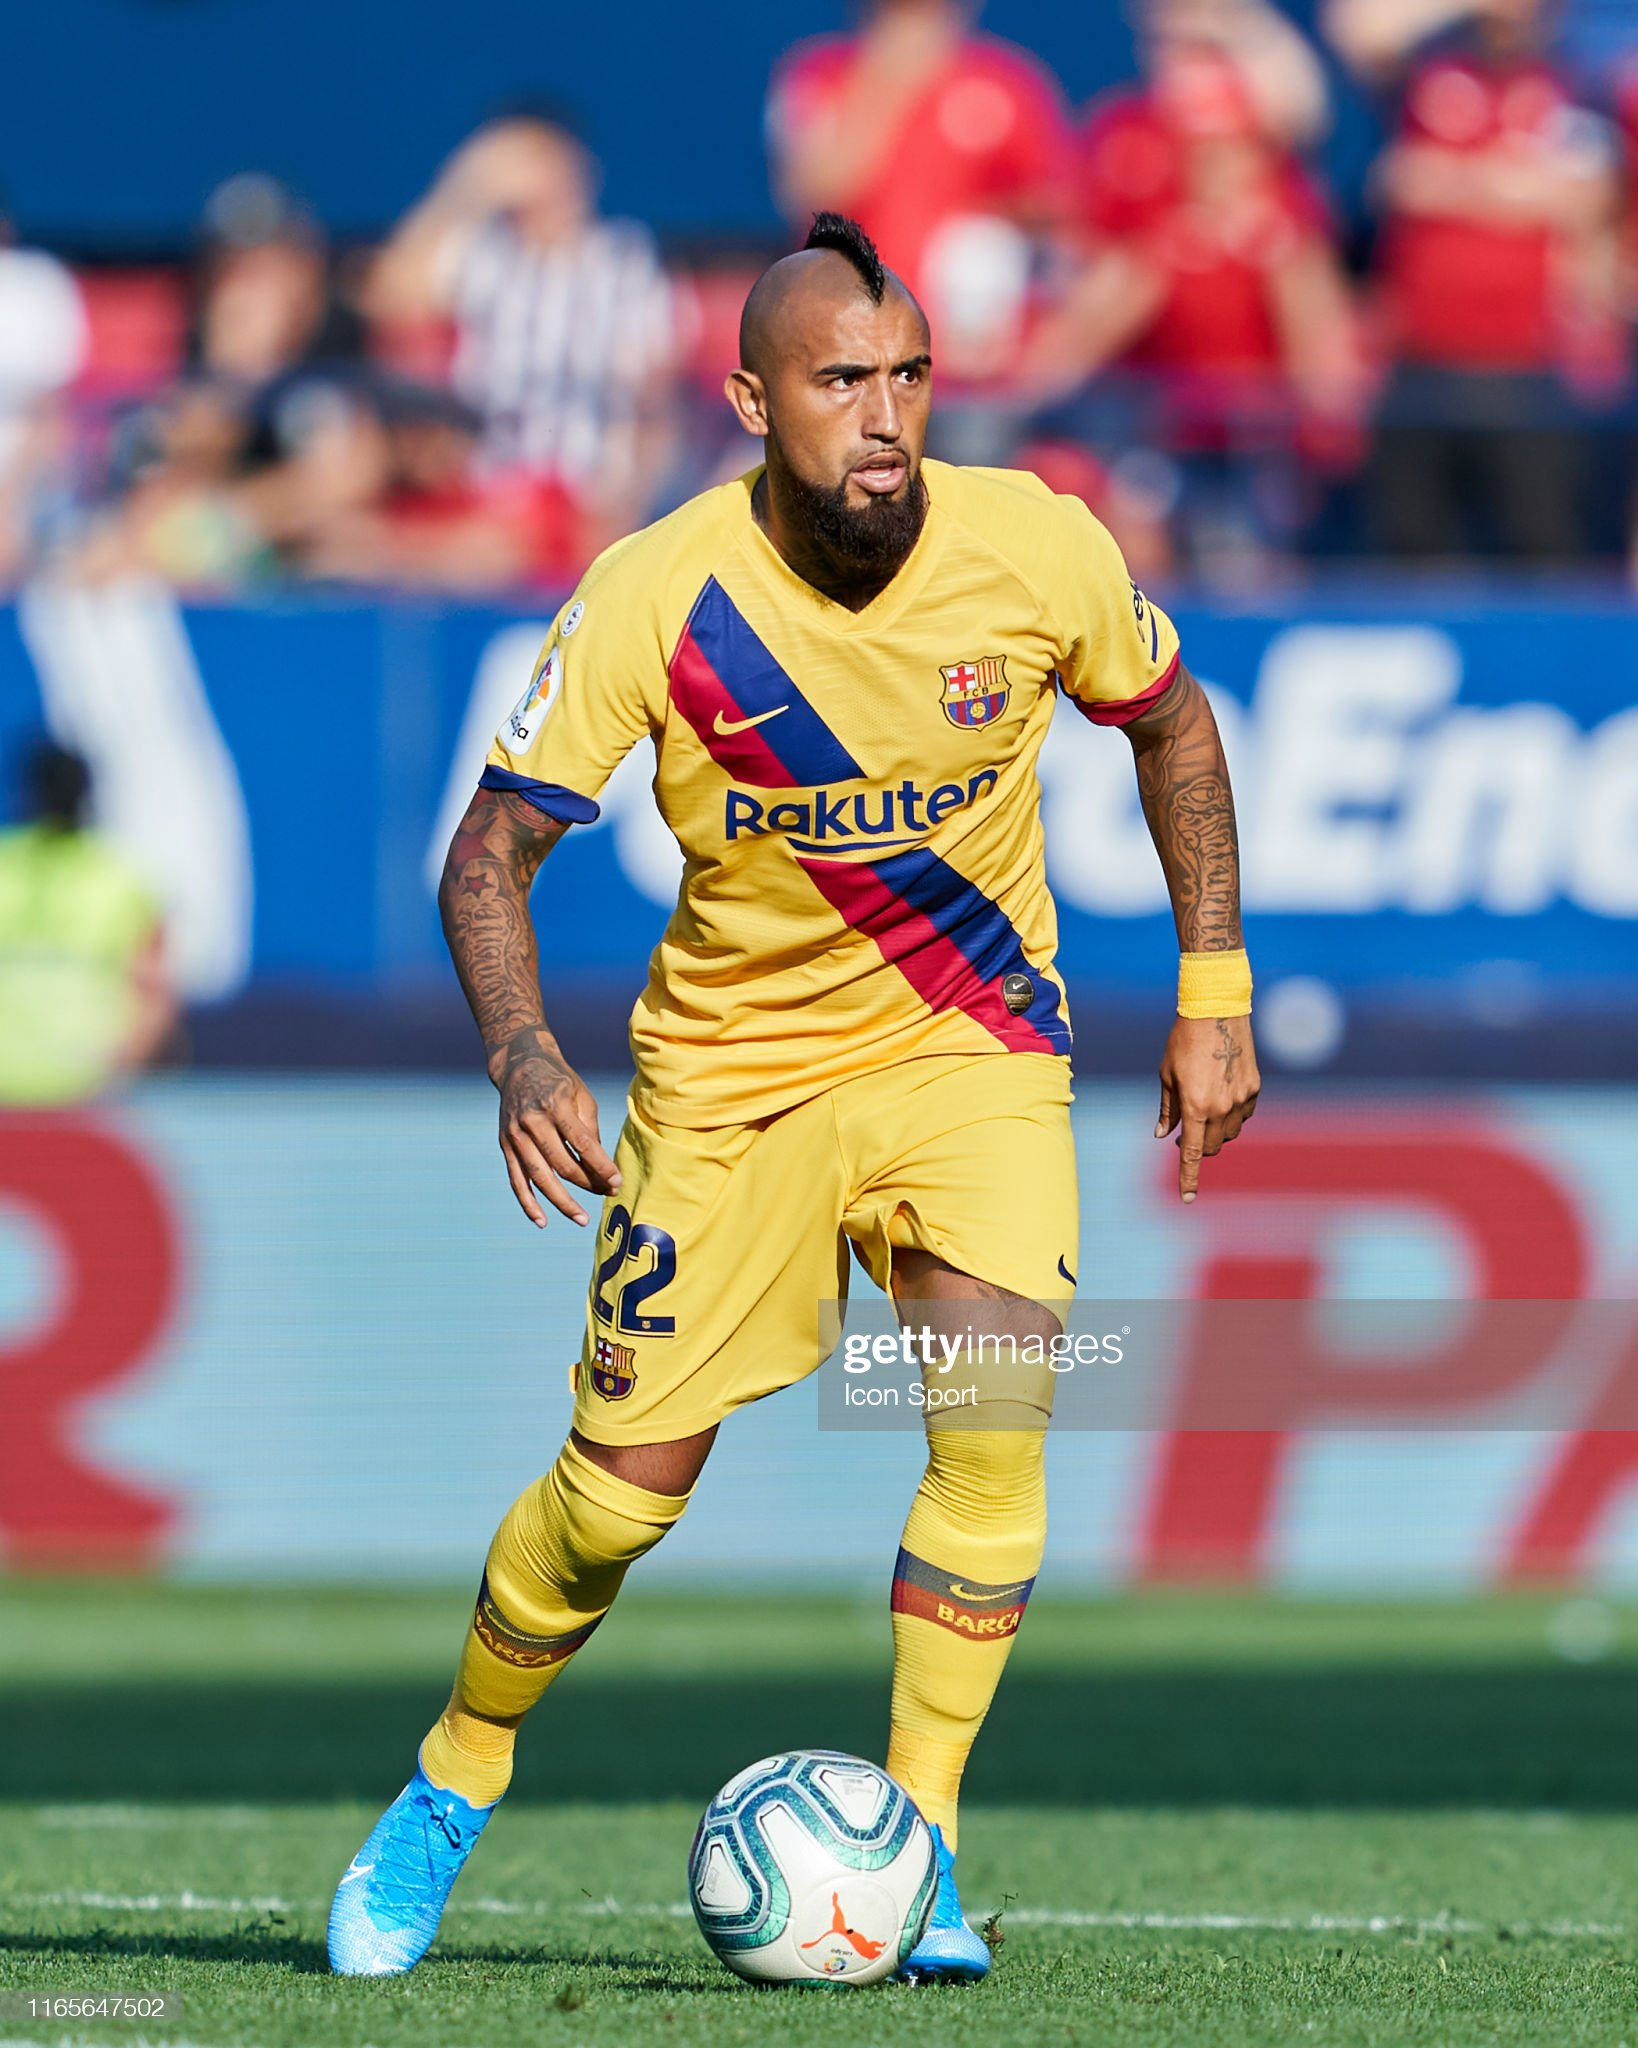 صور مباراة : أوساسونا - برشلونة 2-2 ( 31-08-2019 )  Arturo-vidal-of-fc-barcelona-during-the-liga-match-between-osasuna-picture-id1165647502?s=2048x2048